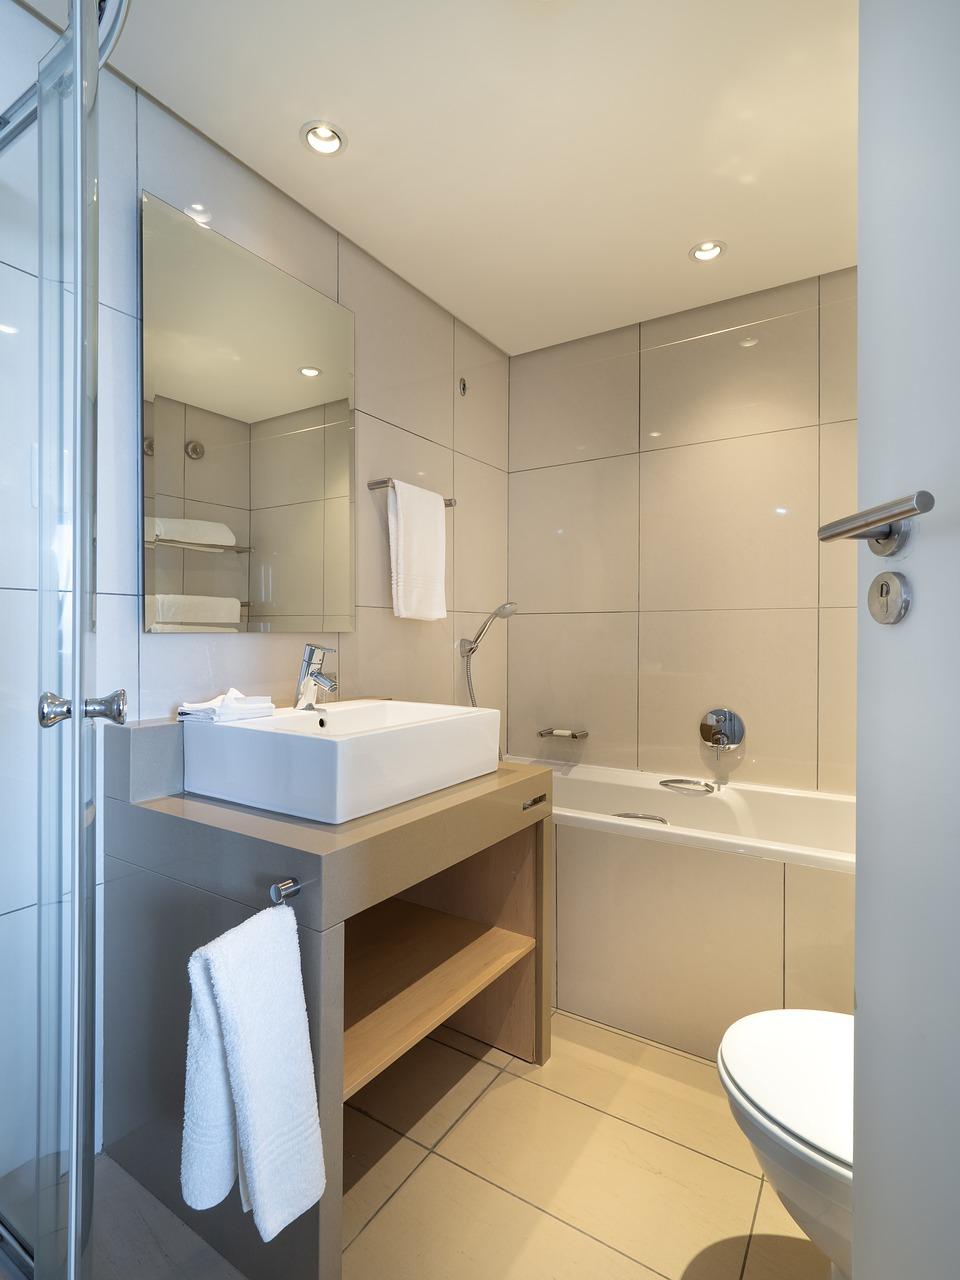 Hotel bathroom, interior, sink, bath, home - free image from